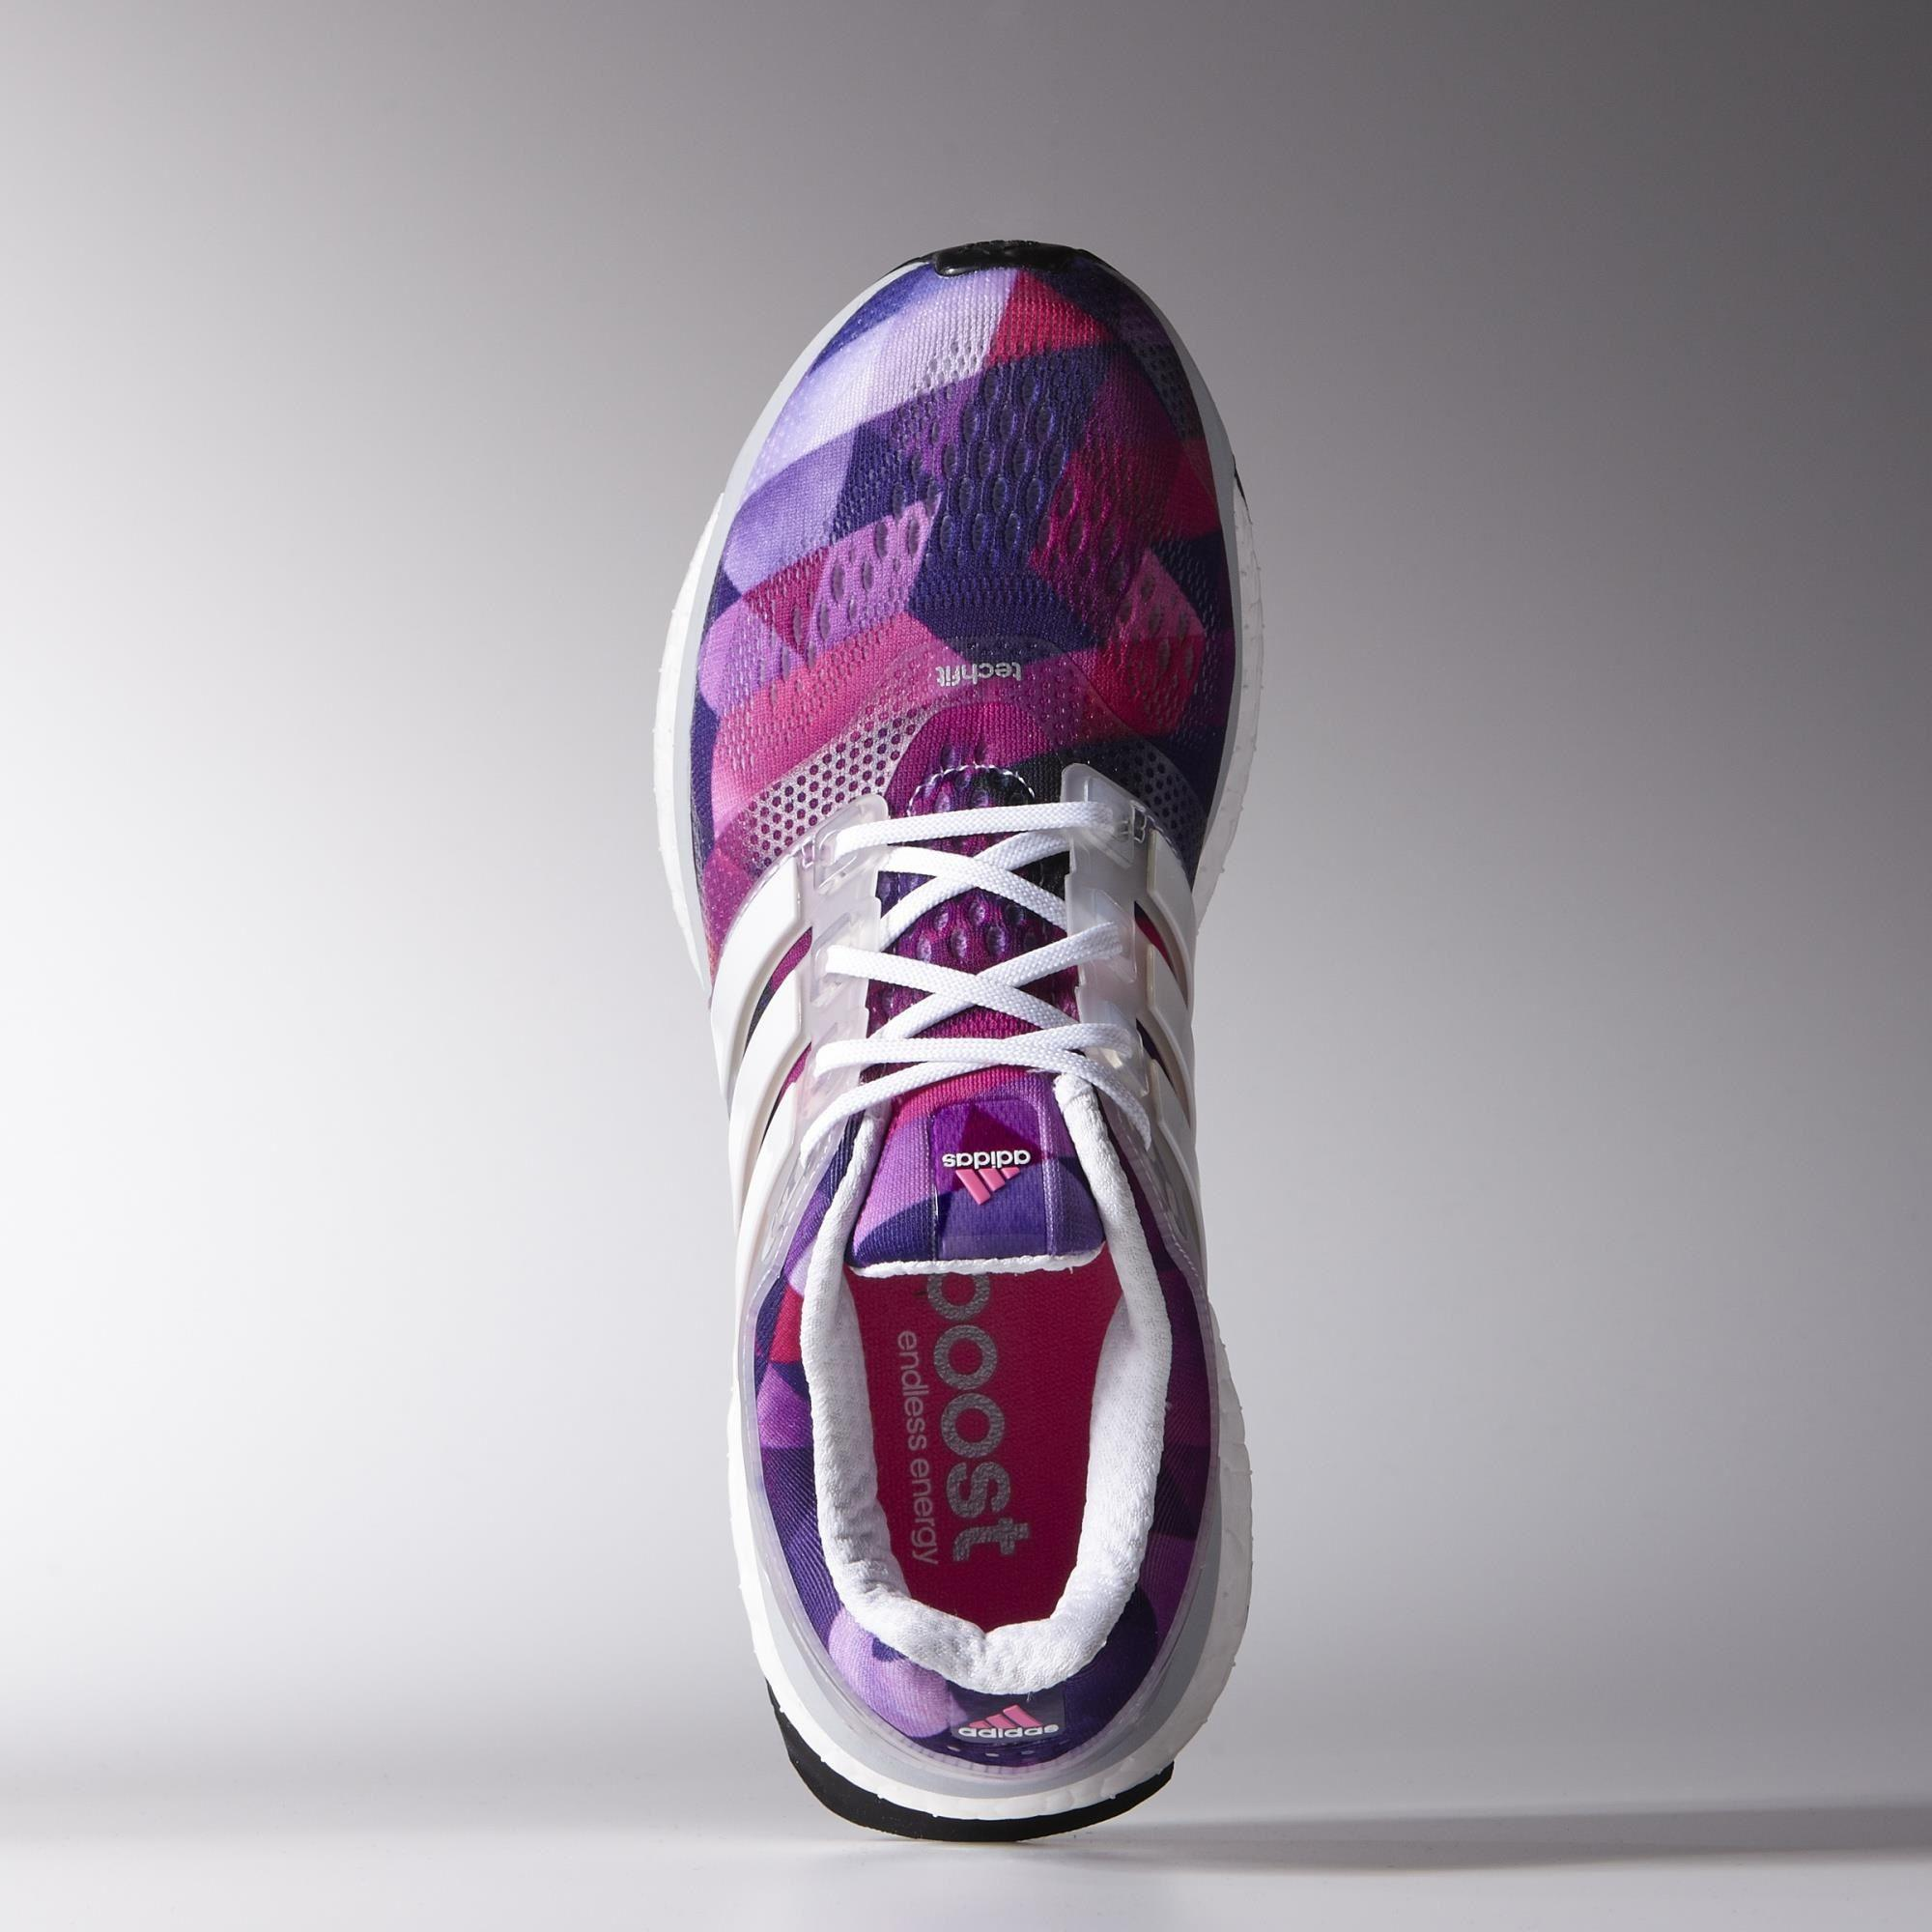 adidas boost endless energy femme